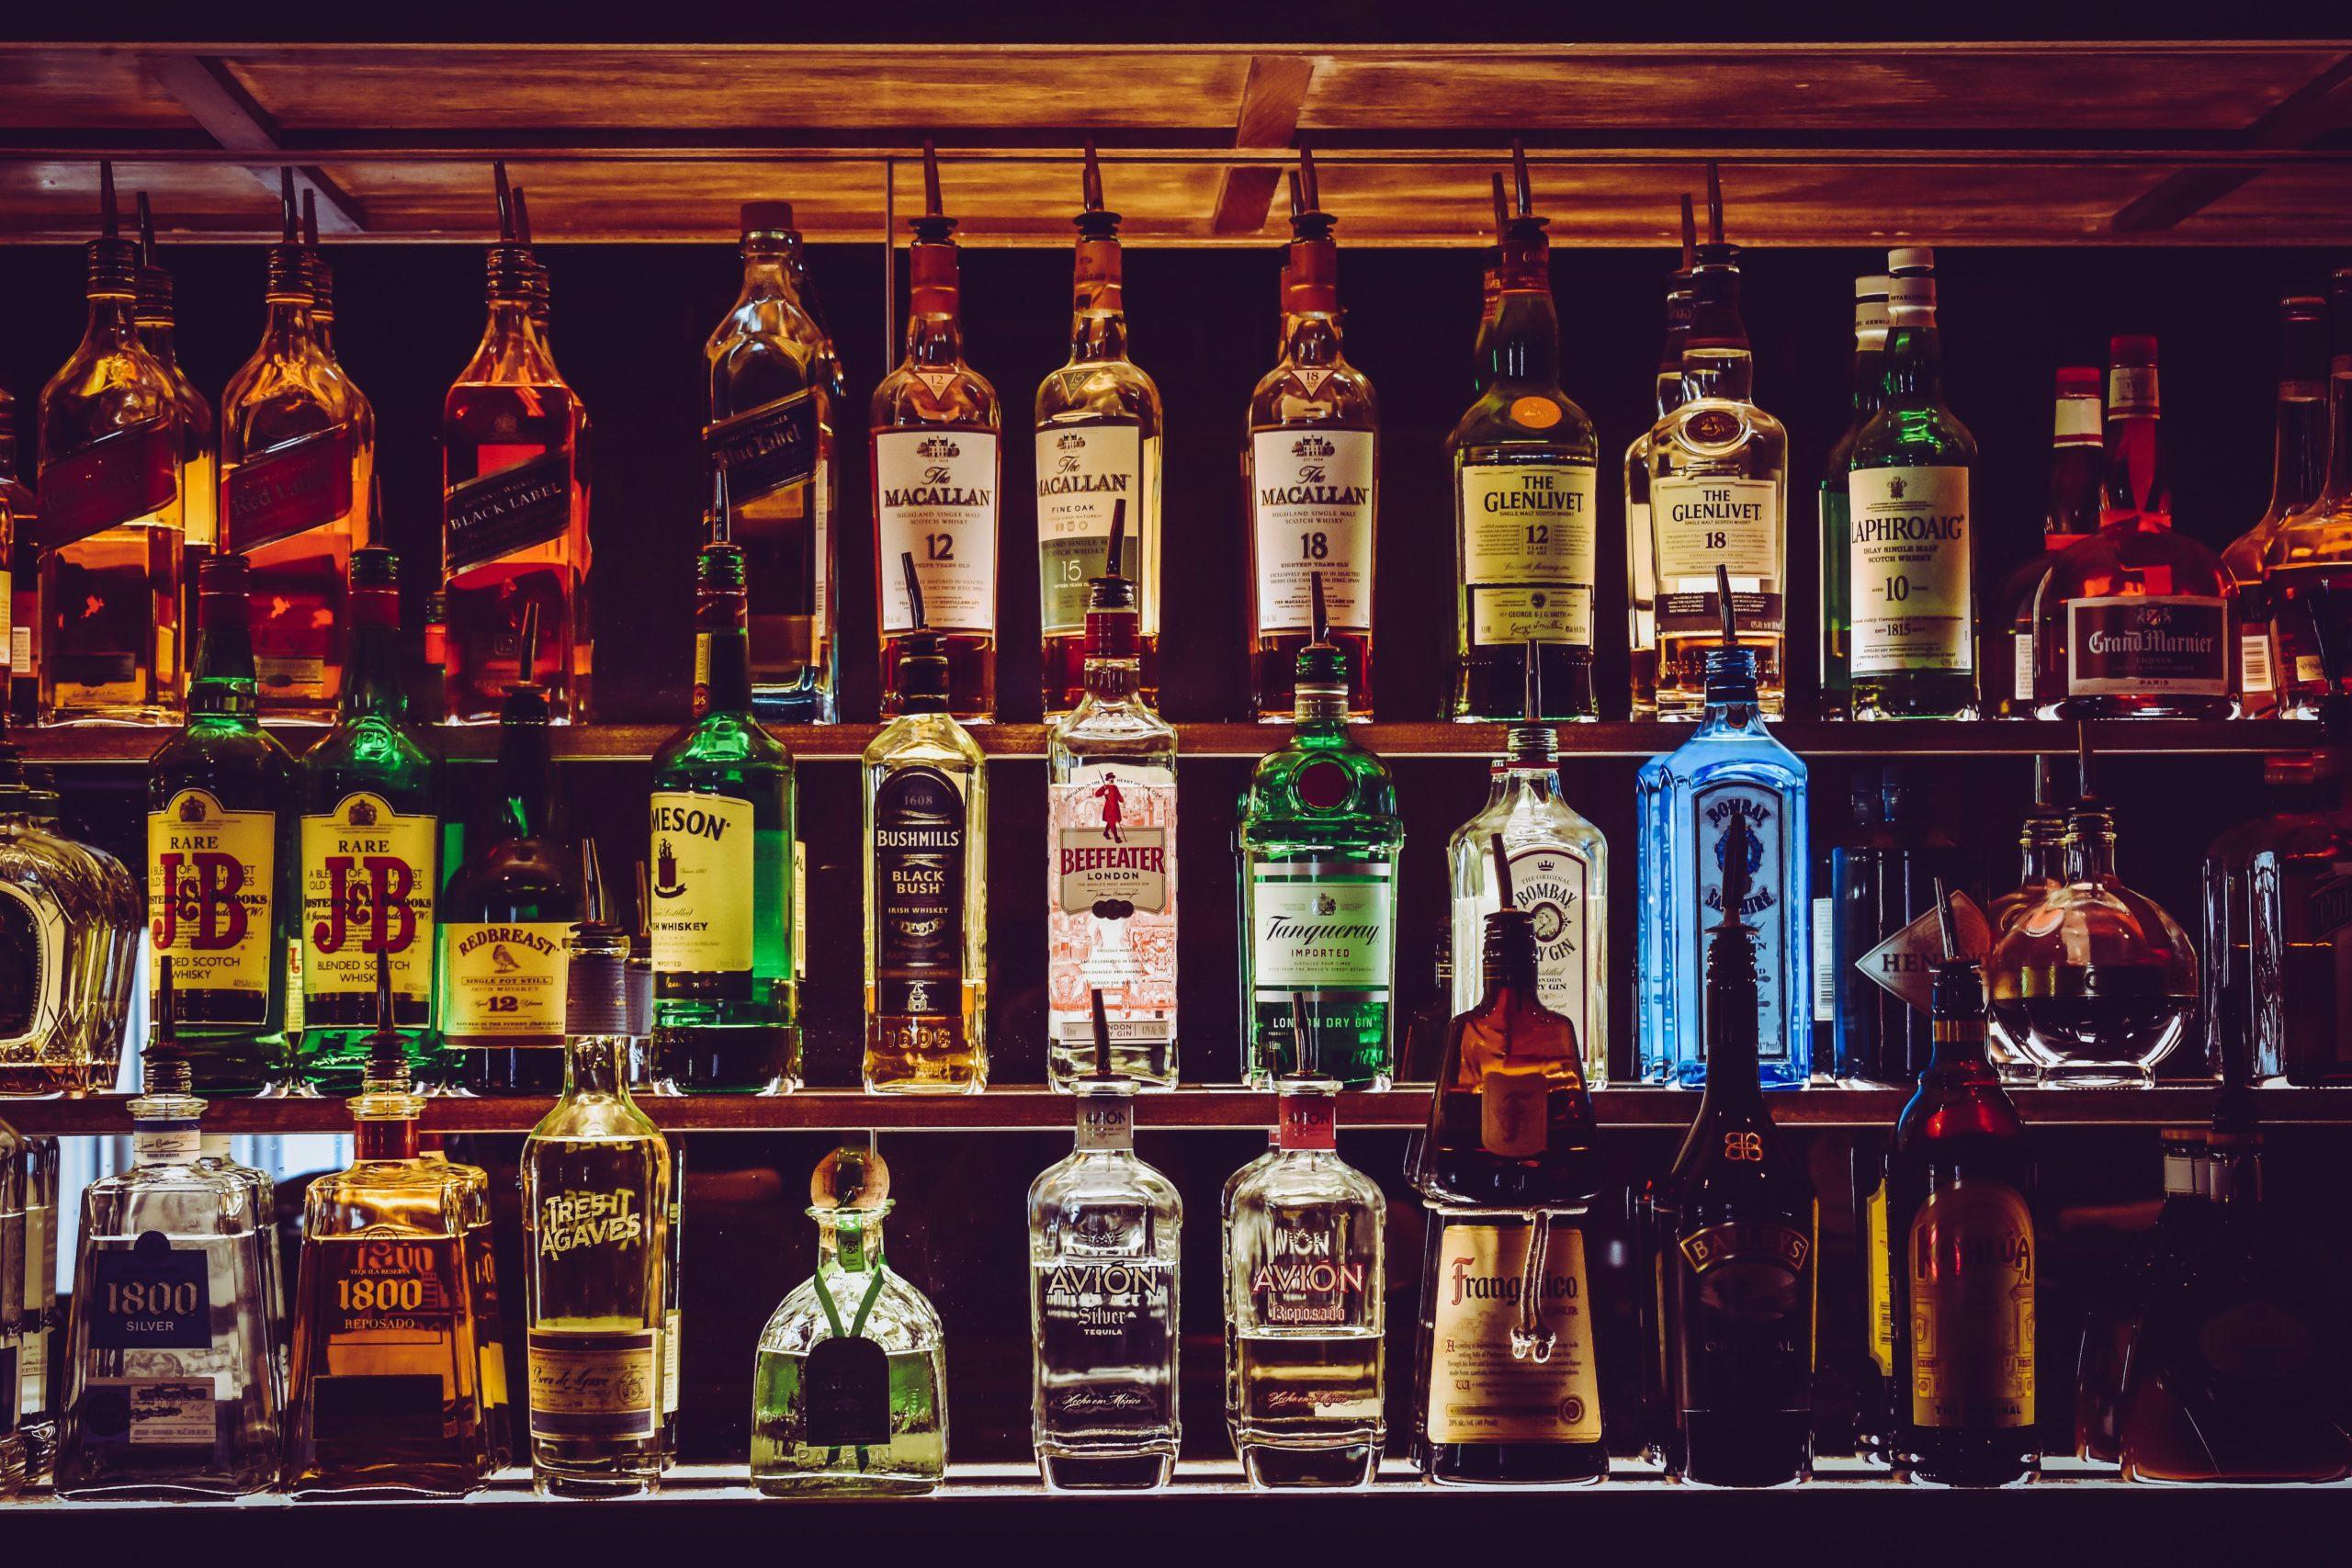 shelves with liquor in a dark bar